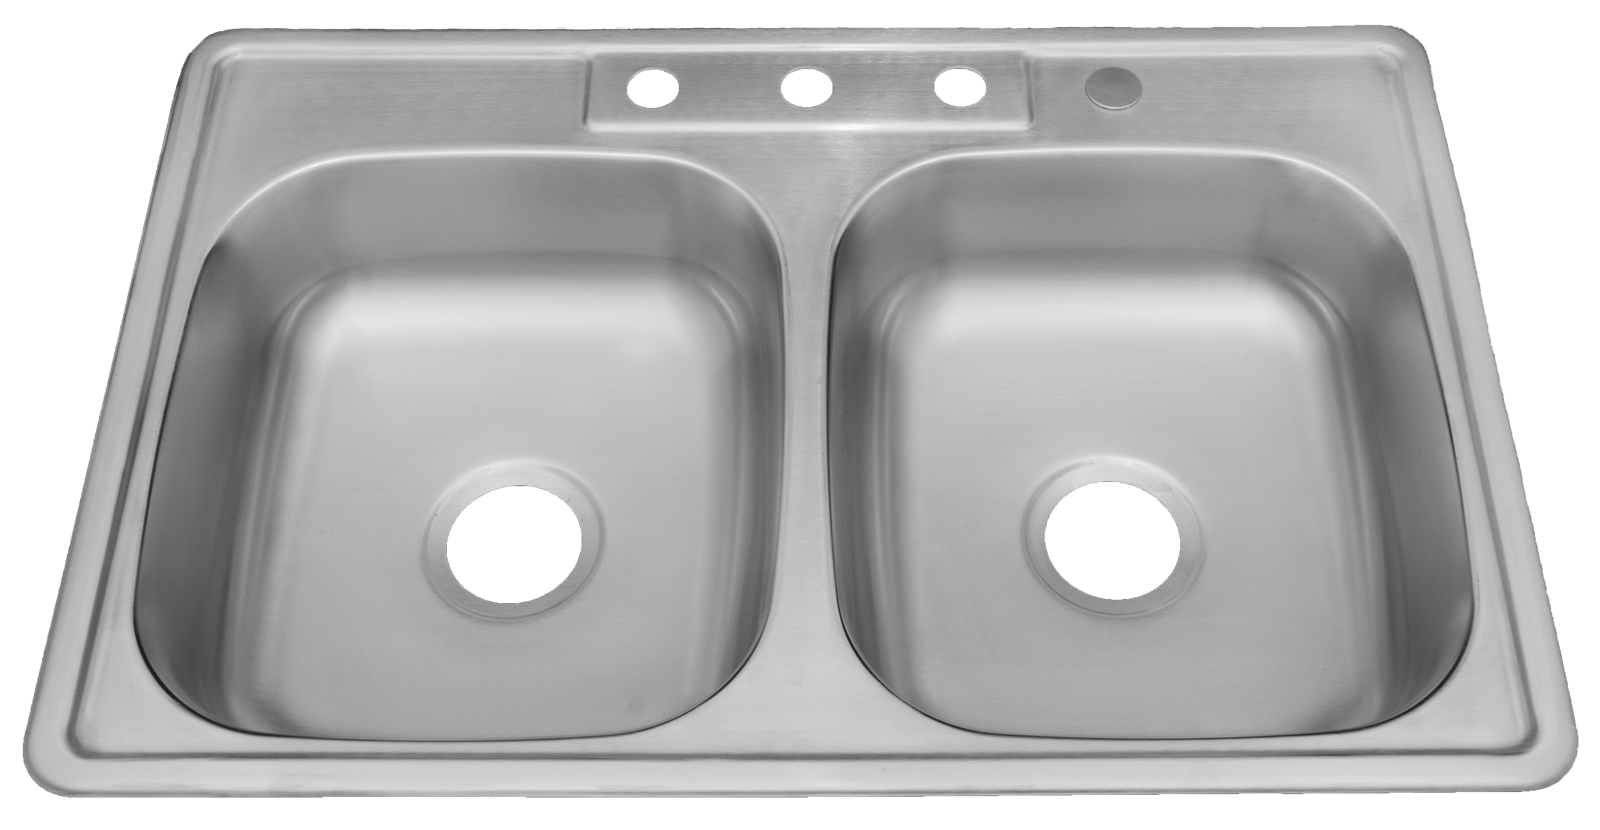 ada compliant 22 gauge stainless steel 4 hole drop in sink 50 50 double bowl blue pearl stone